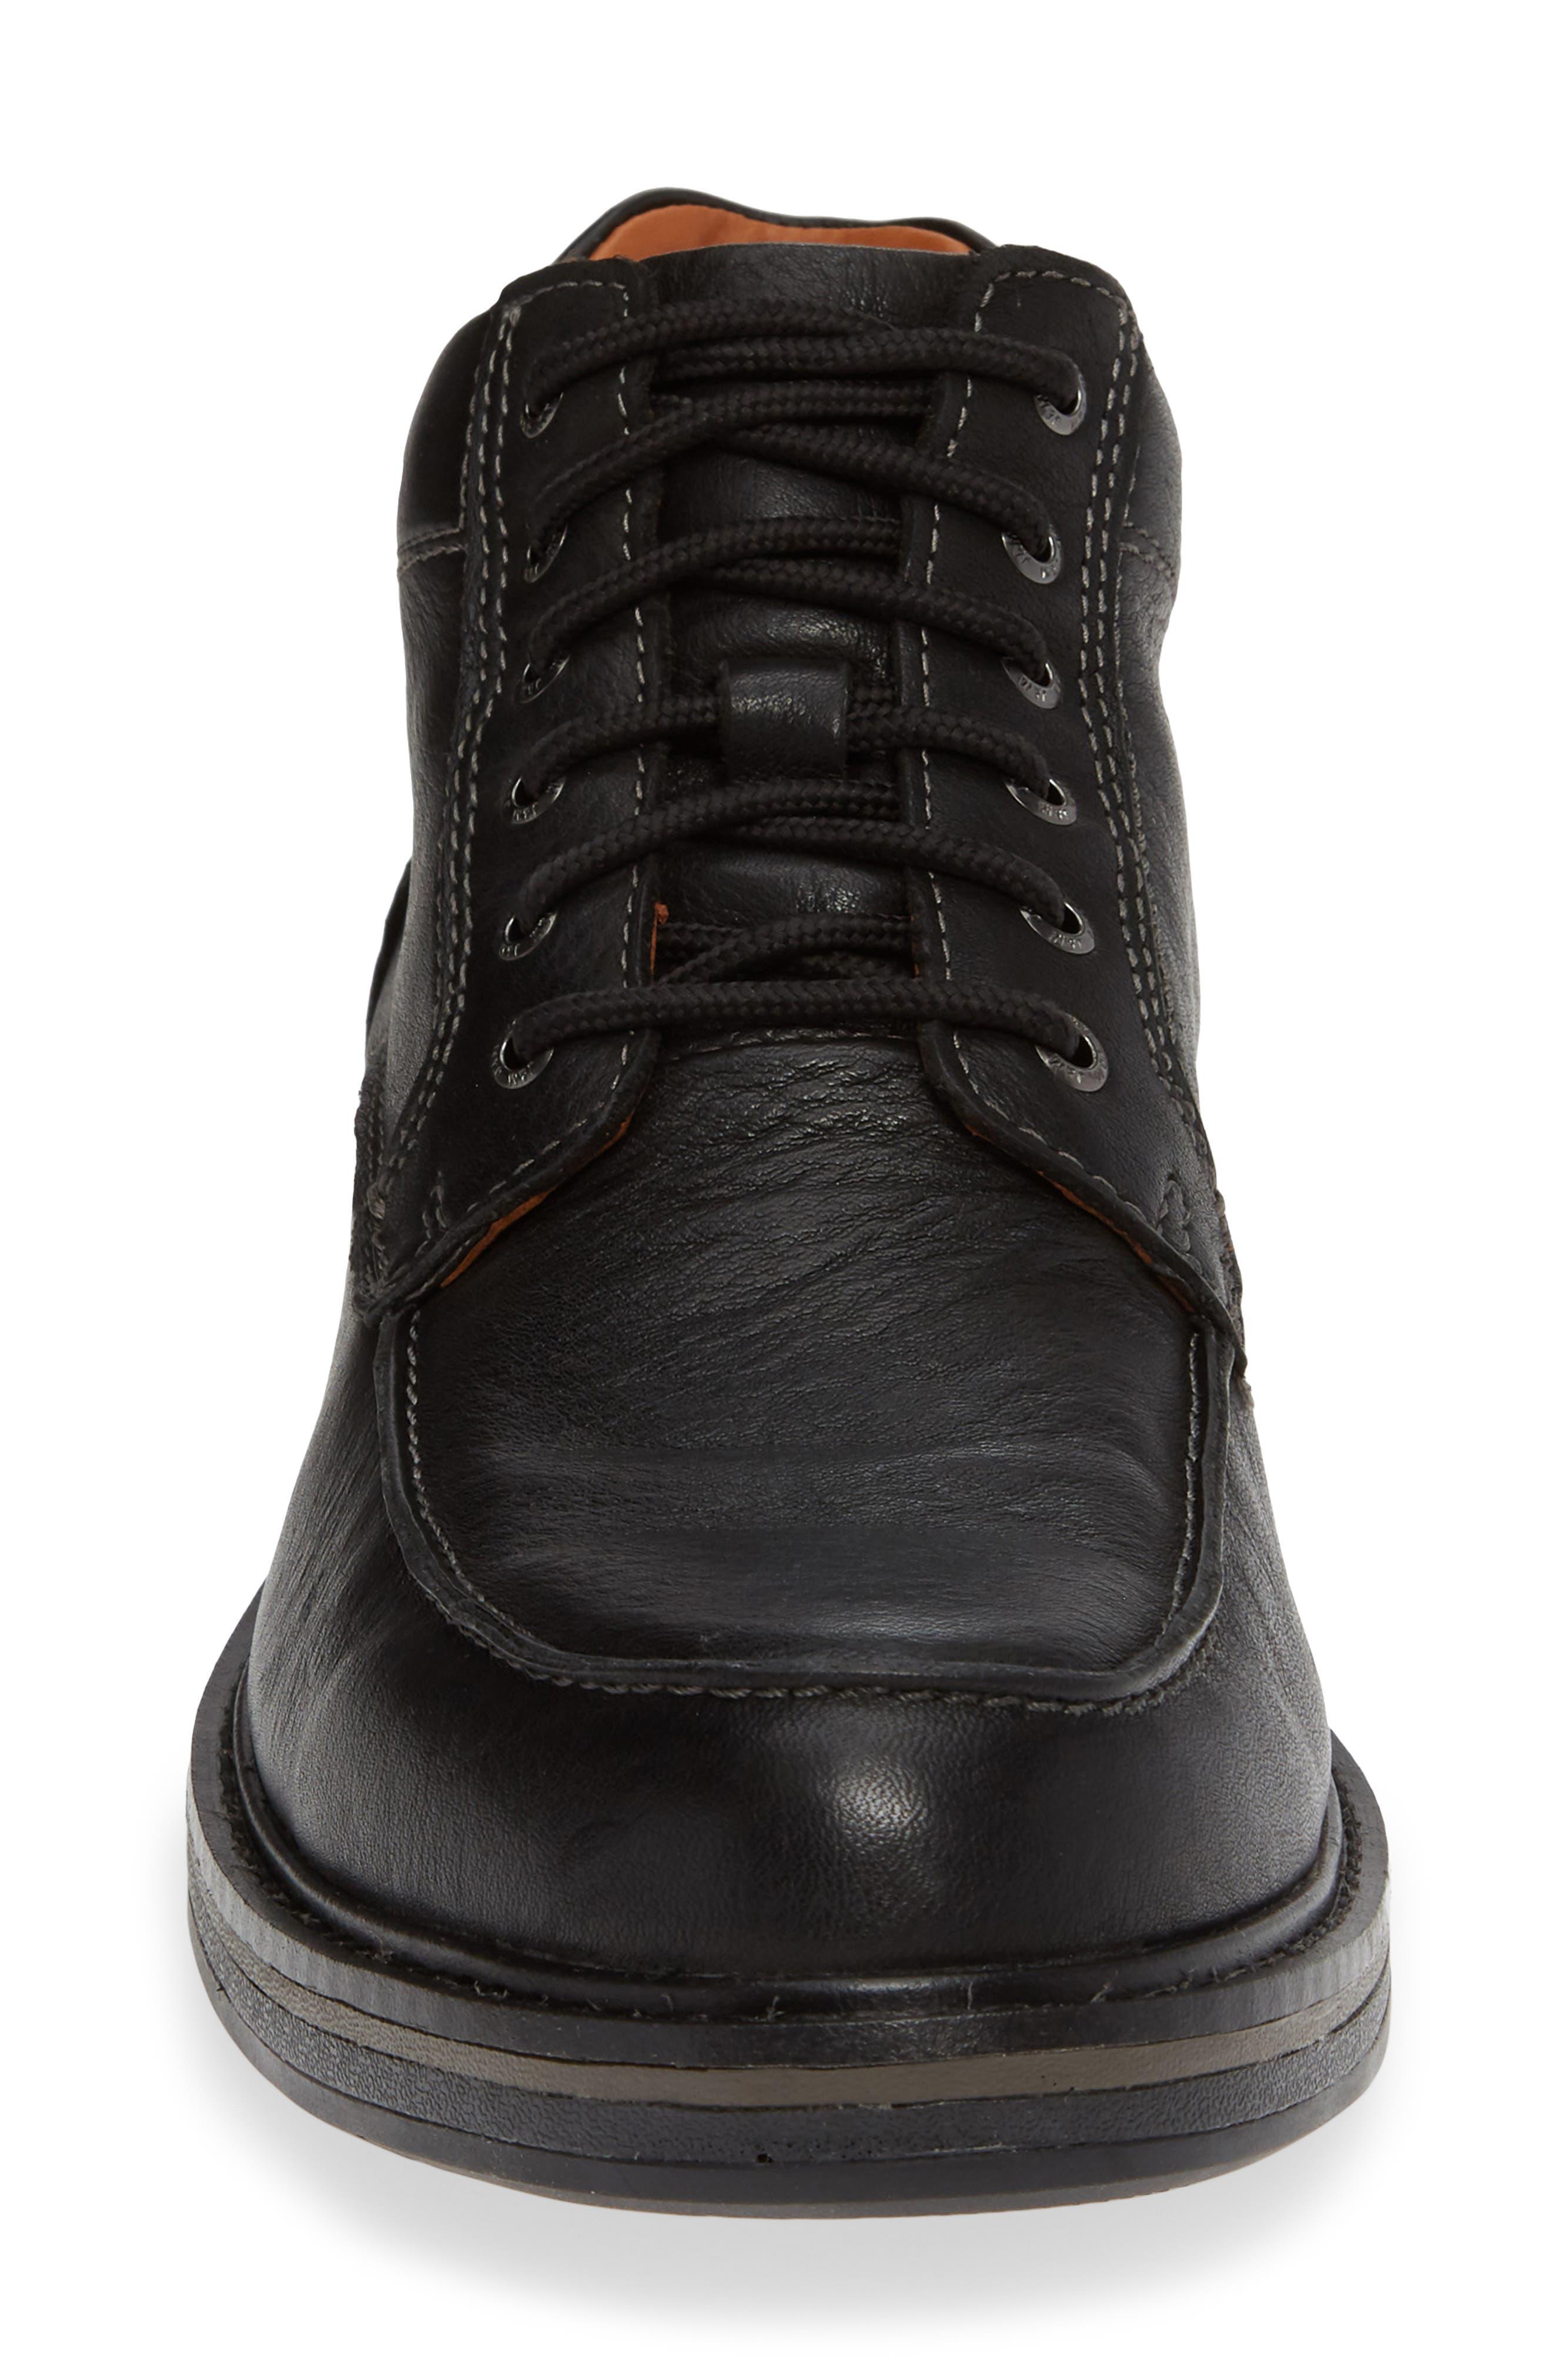 Rutledge Waterproof Moc Toe Boot,                             Alternate thumbnail 4, color,                             BLACK LEATHER